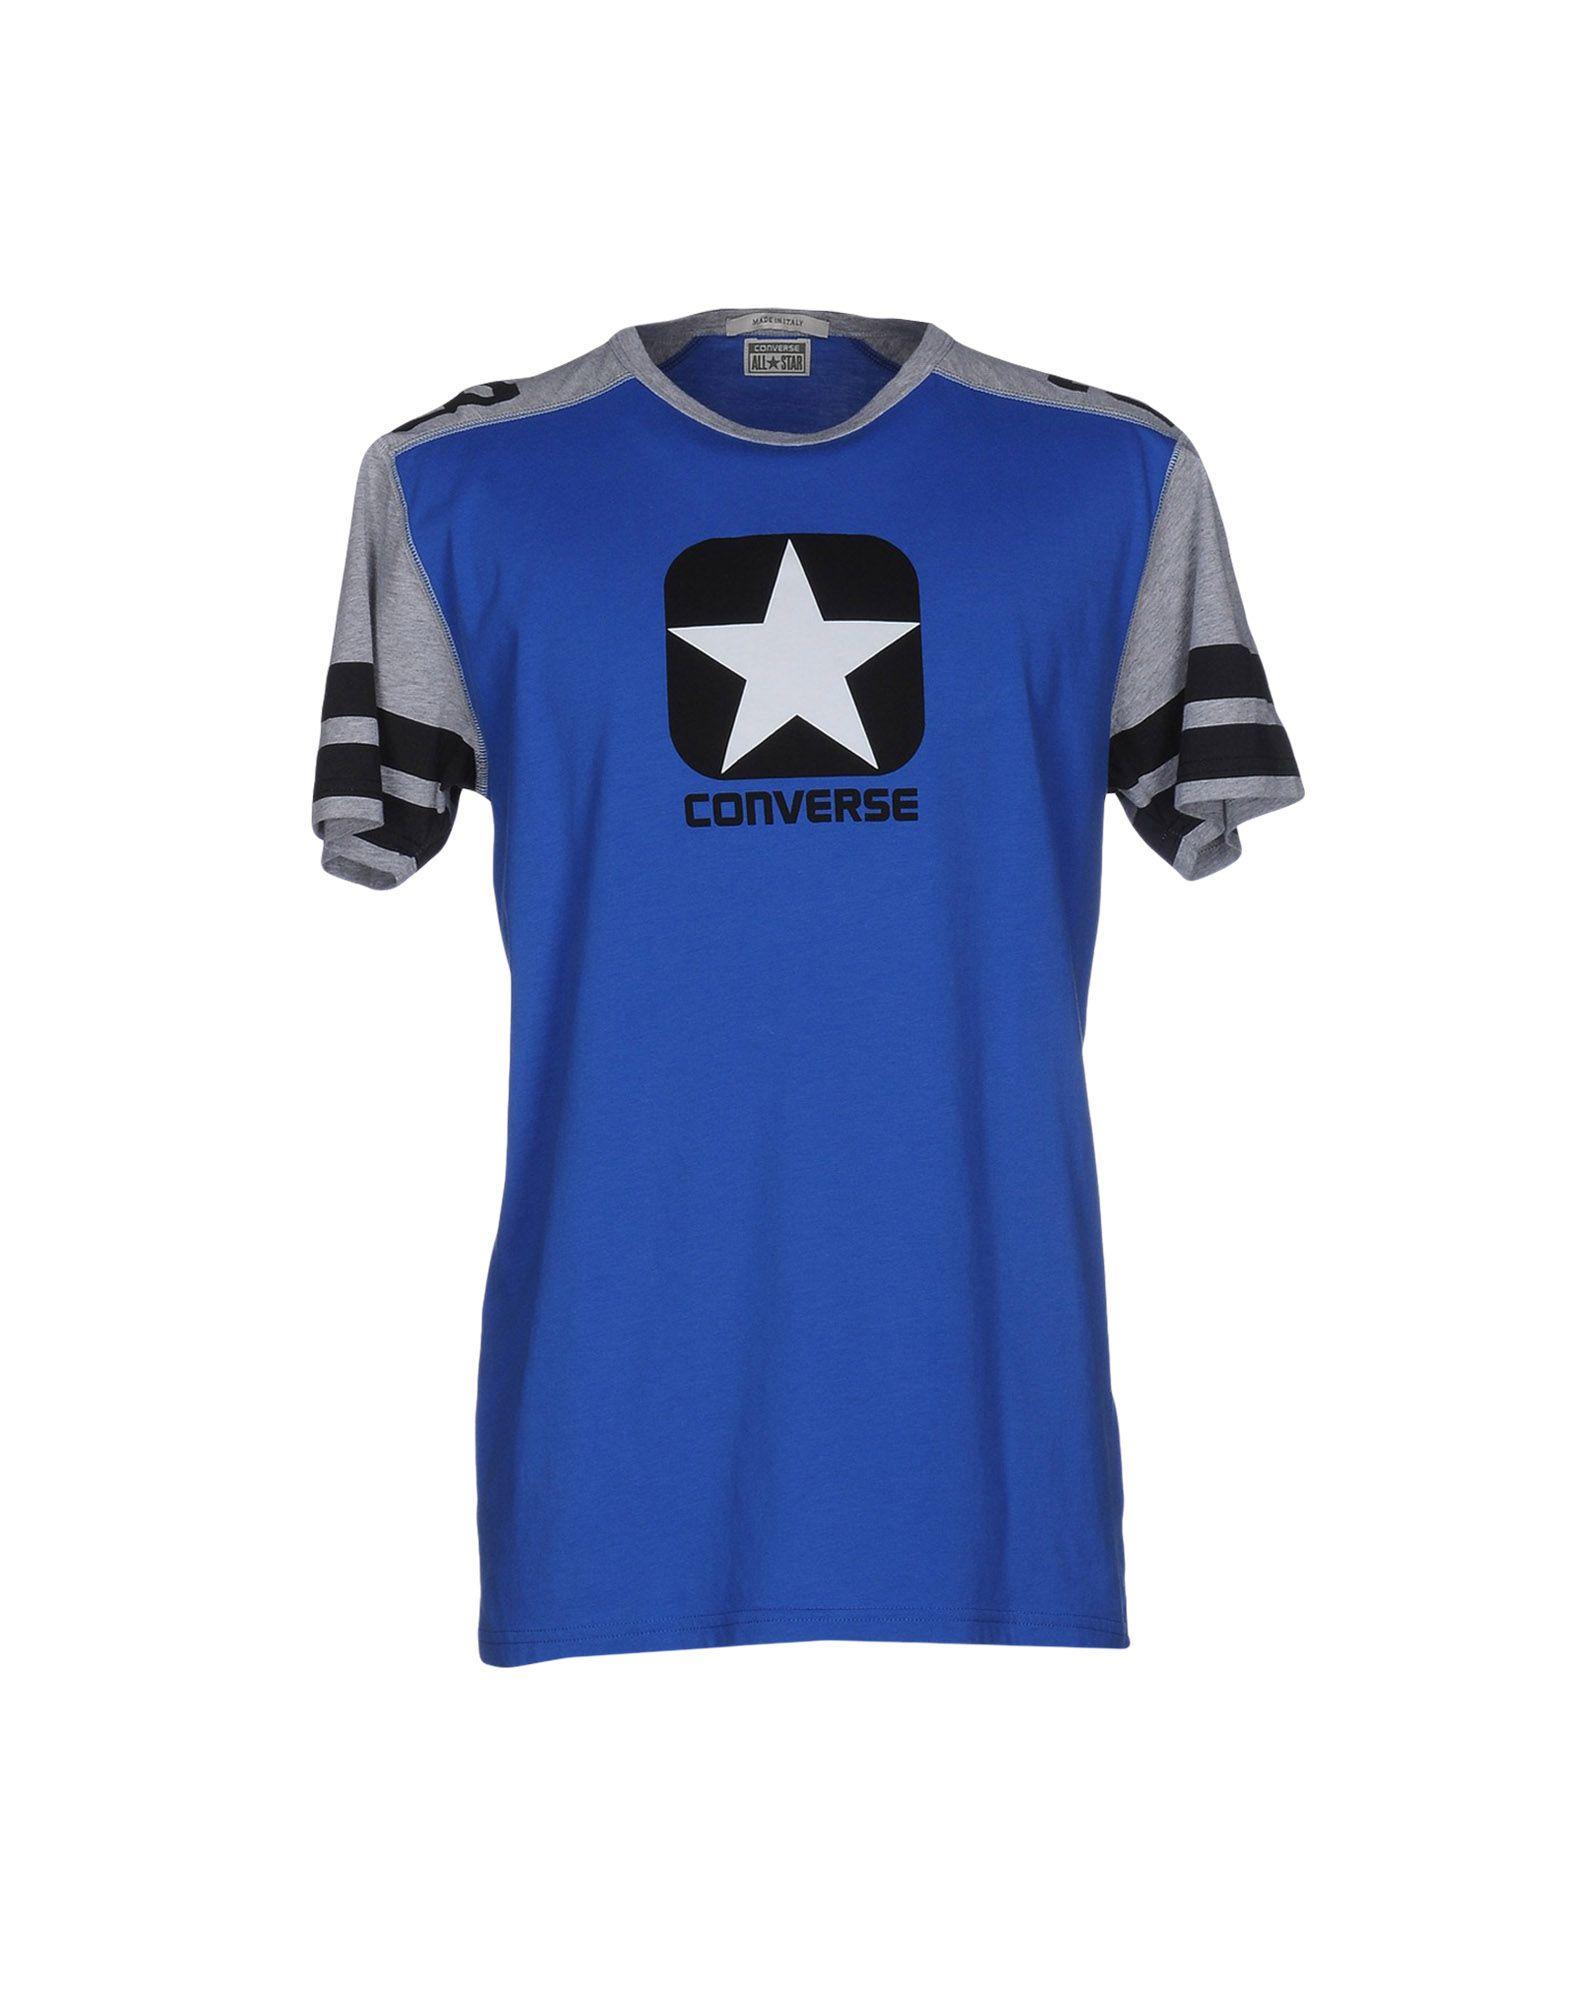 CONVERSE ALL STAR Футболка футболка мужская cms 110000 all star logo